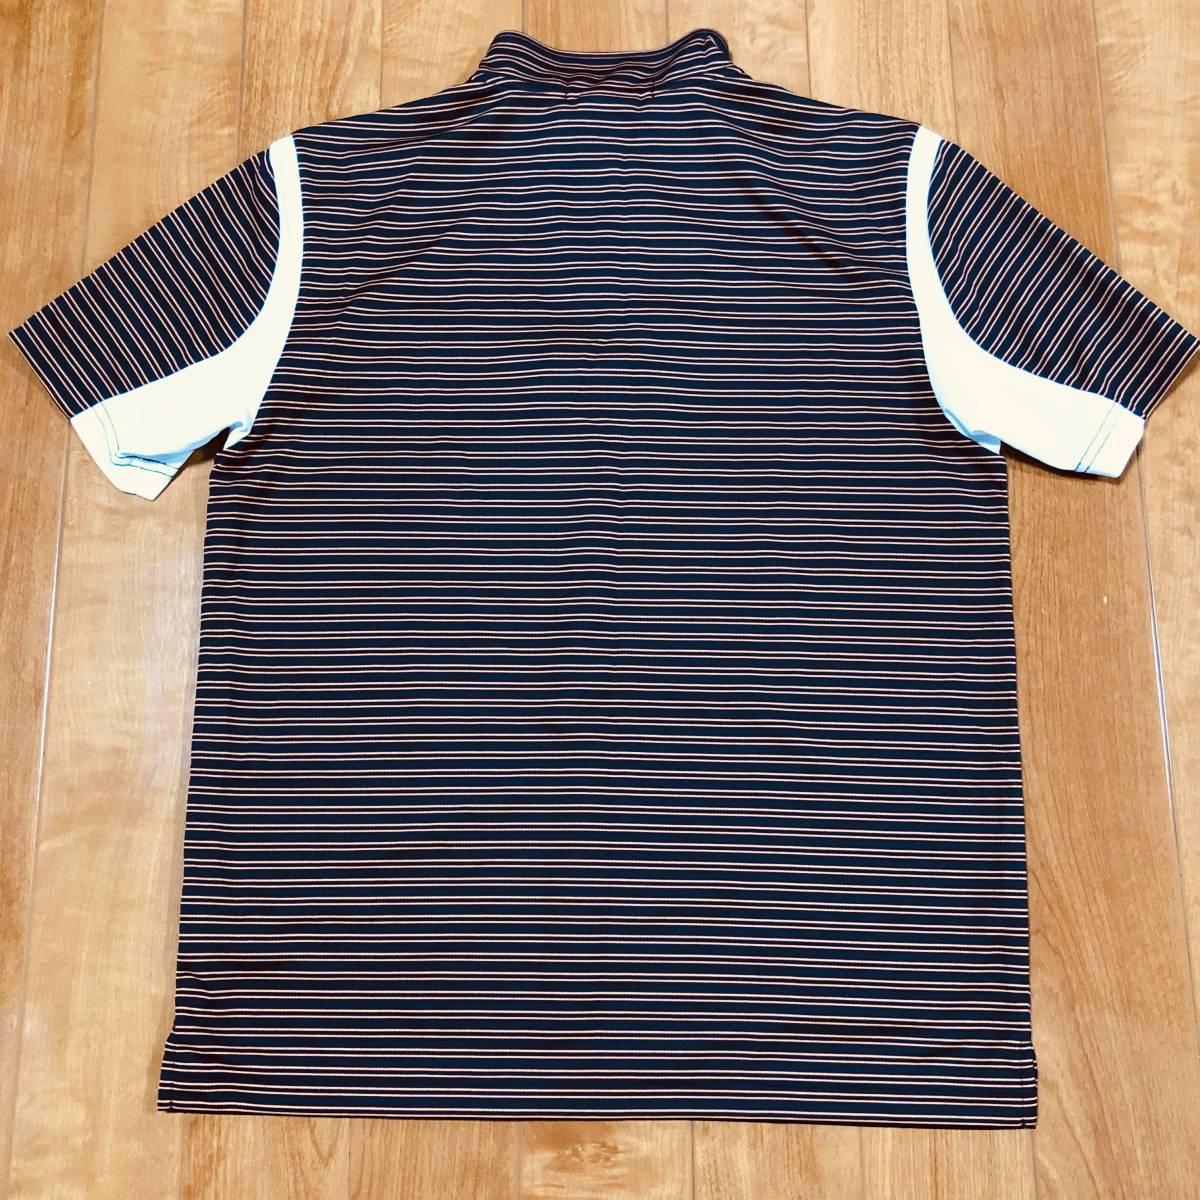 【le coq sportif golf】 ルコック ゴルフ ゴルフウェア 半袖 ハーフジップ ポロシャツ メンズ Mサイズ 美品!_画像2